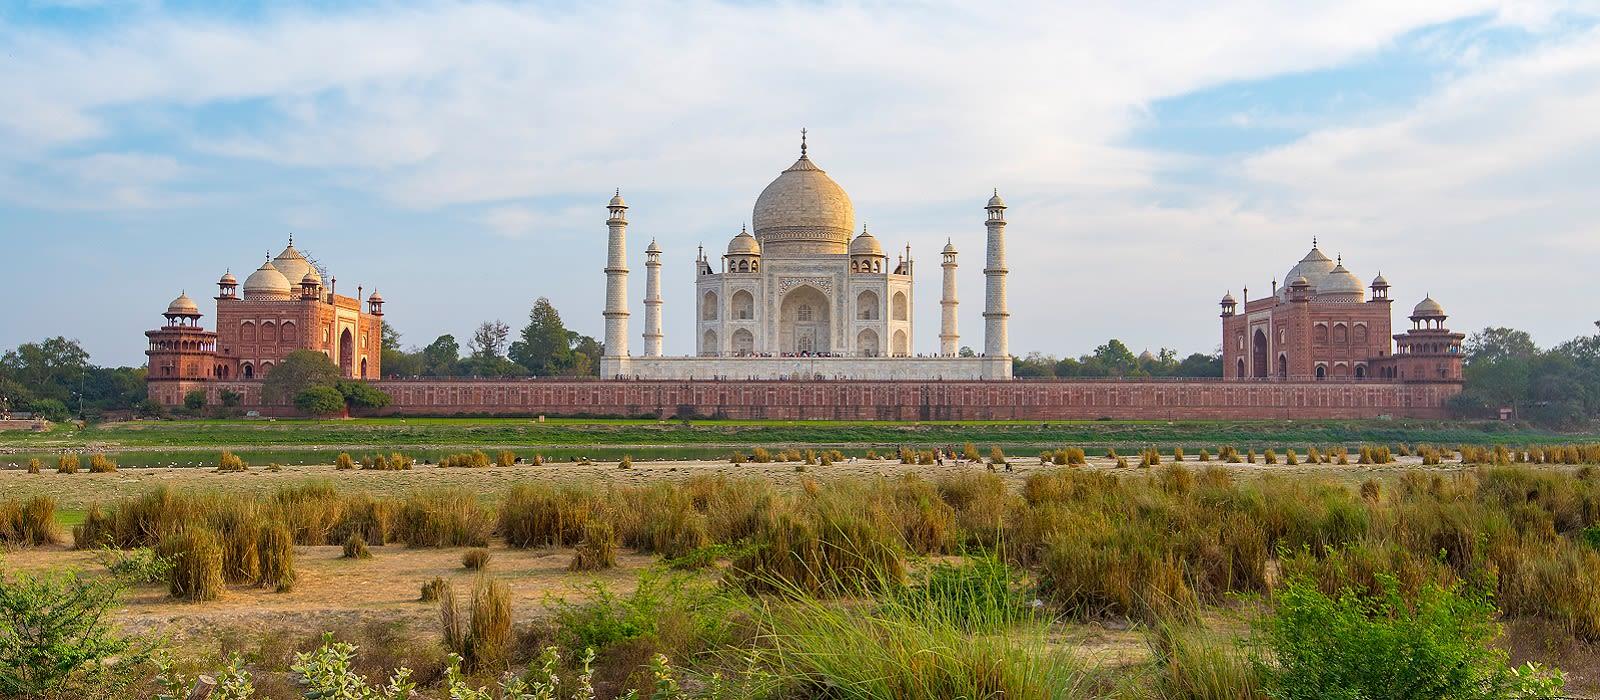 Festival Fieber: Diwali in Indien Urlaub 2